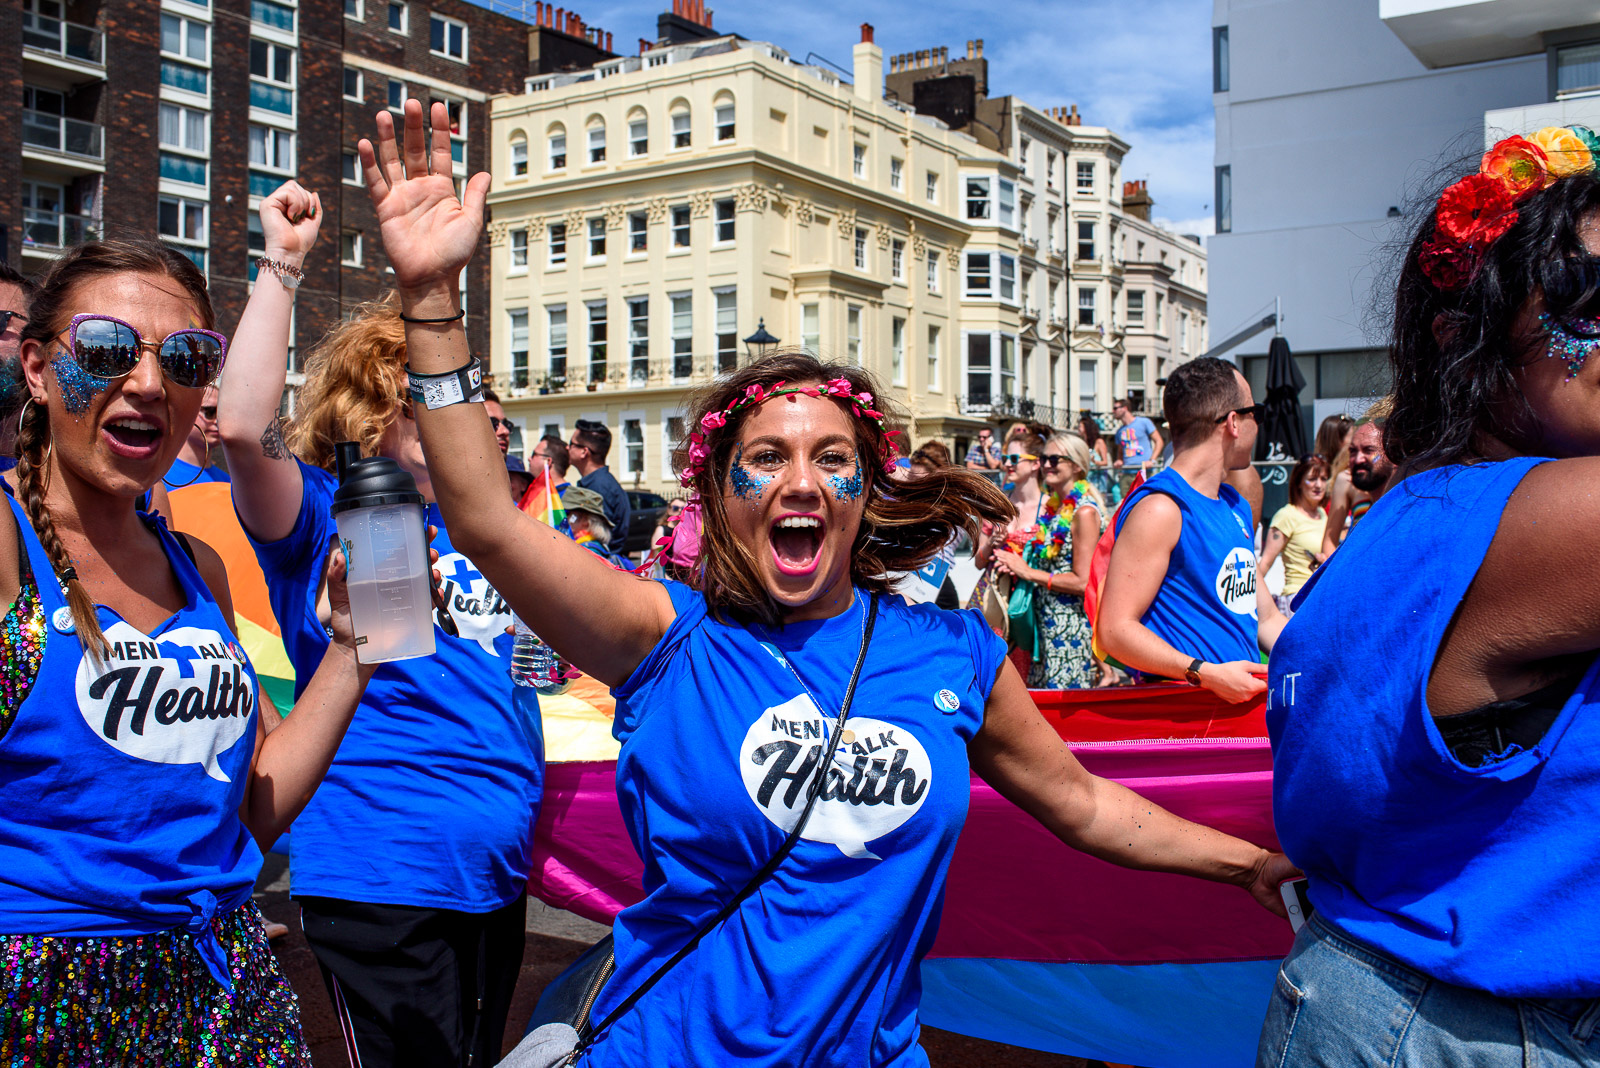 Girl raising awareness for mental health at the Brighton Pride Parade